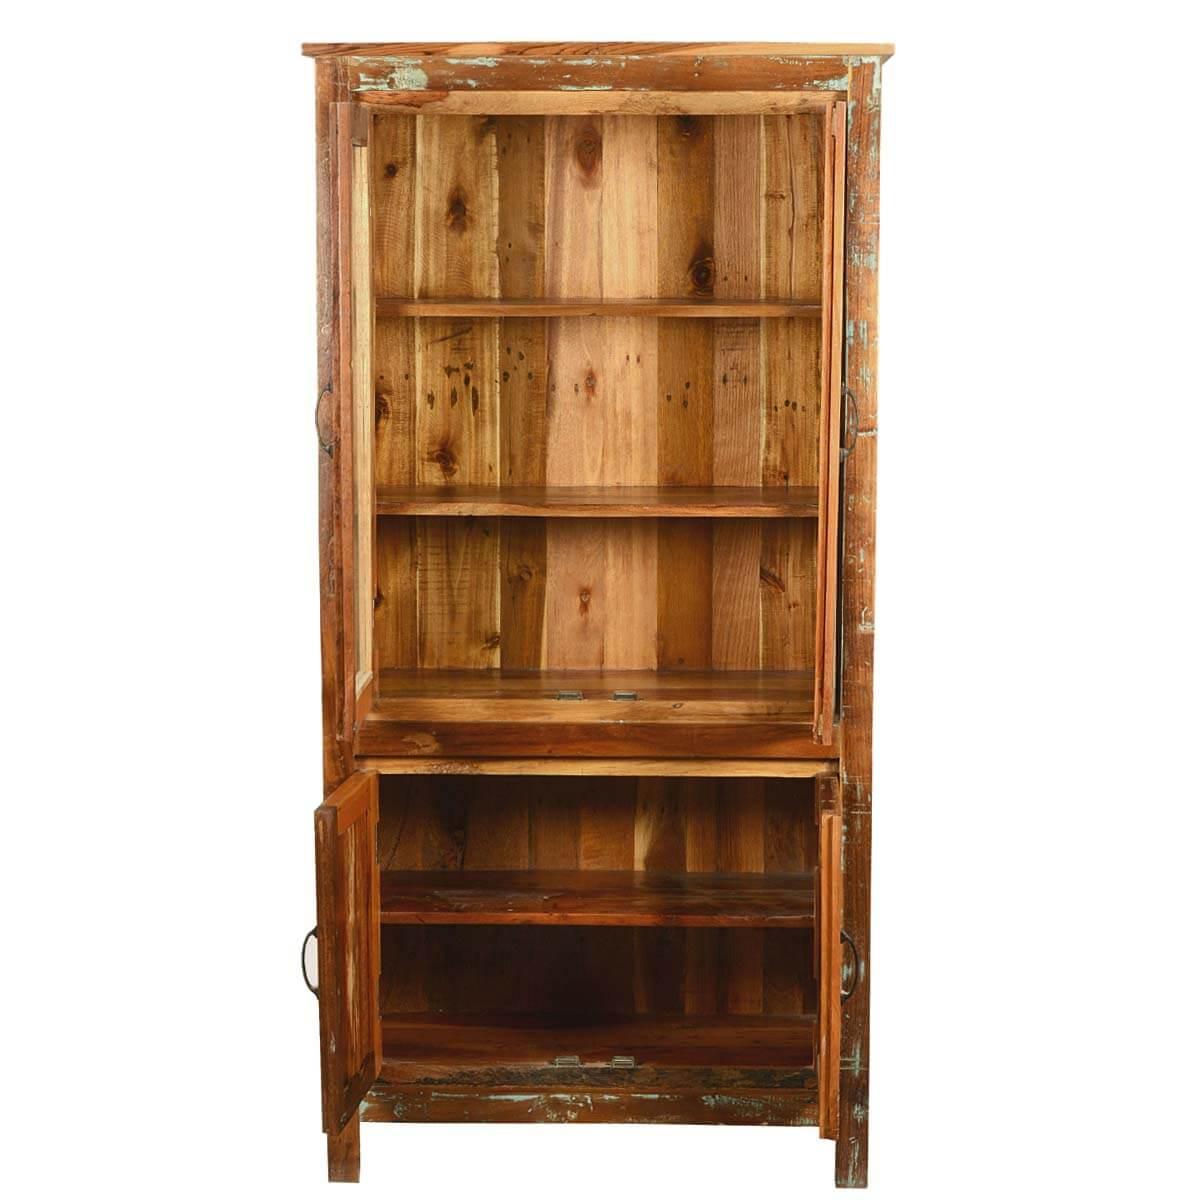 Bethlehem Rustic Reclaimed Wood Glass Door Tall Display Cabinet